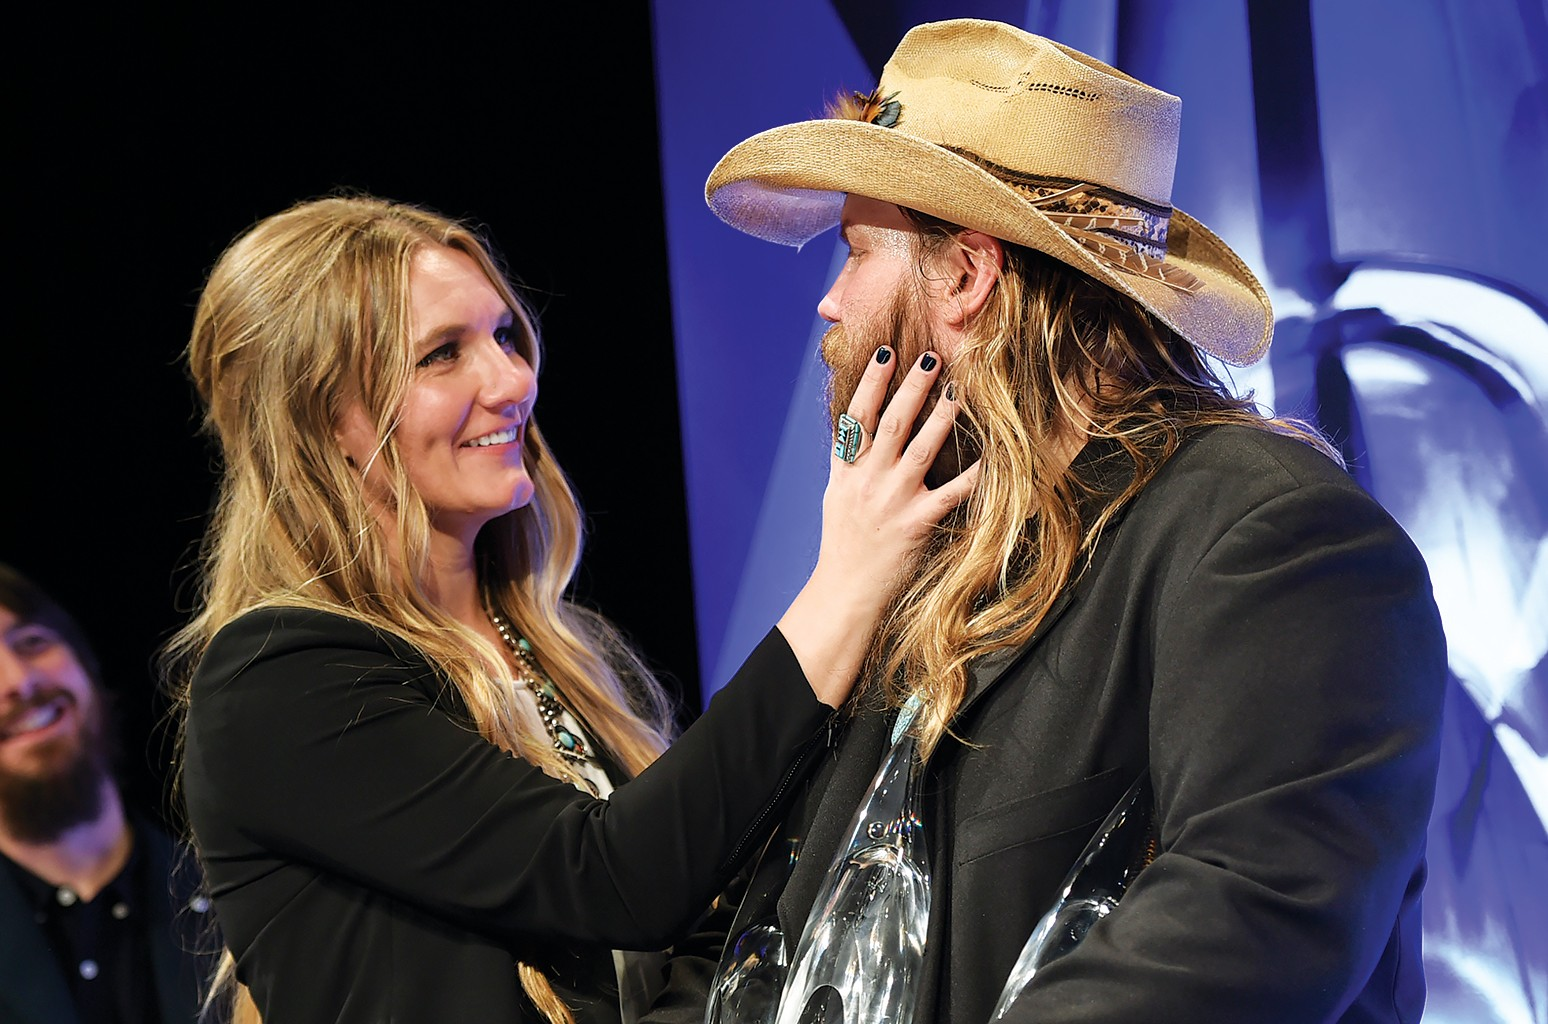 Morgane Stapleton and Chris Stapleton CMA 2015